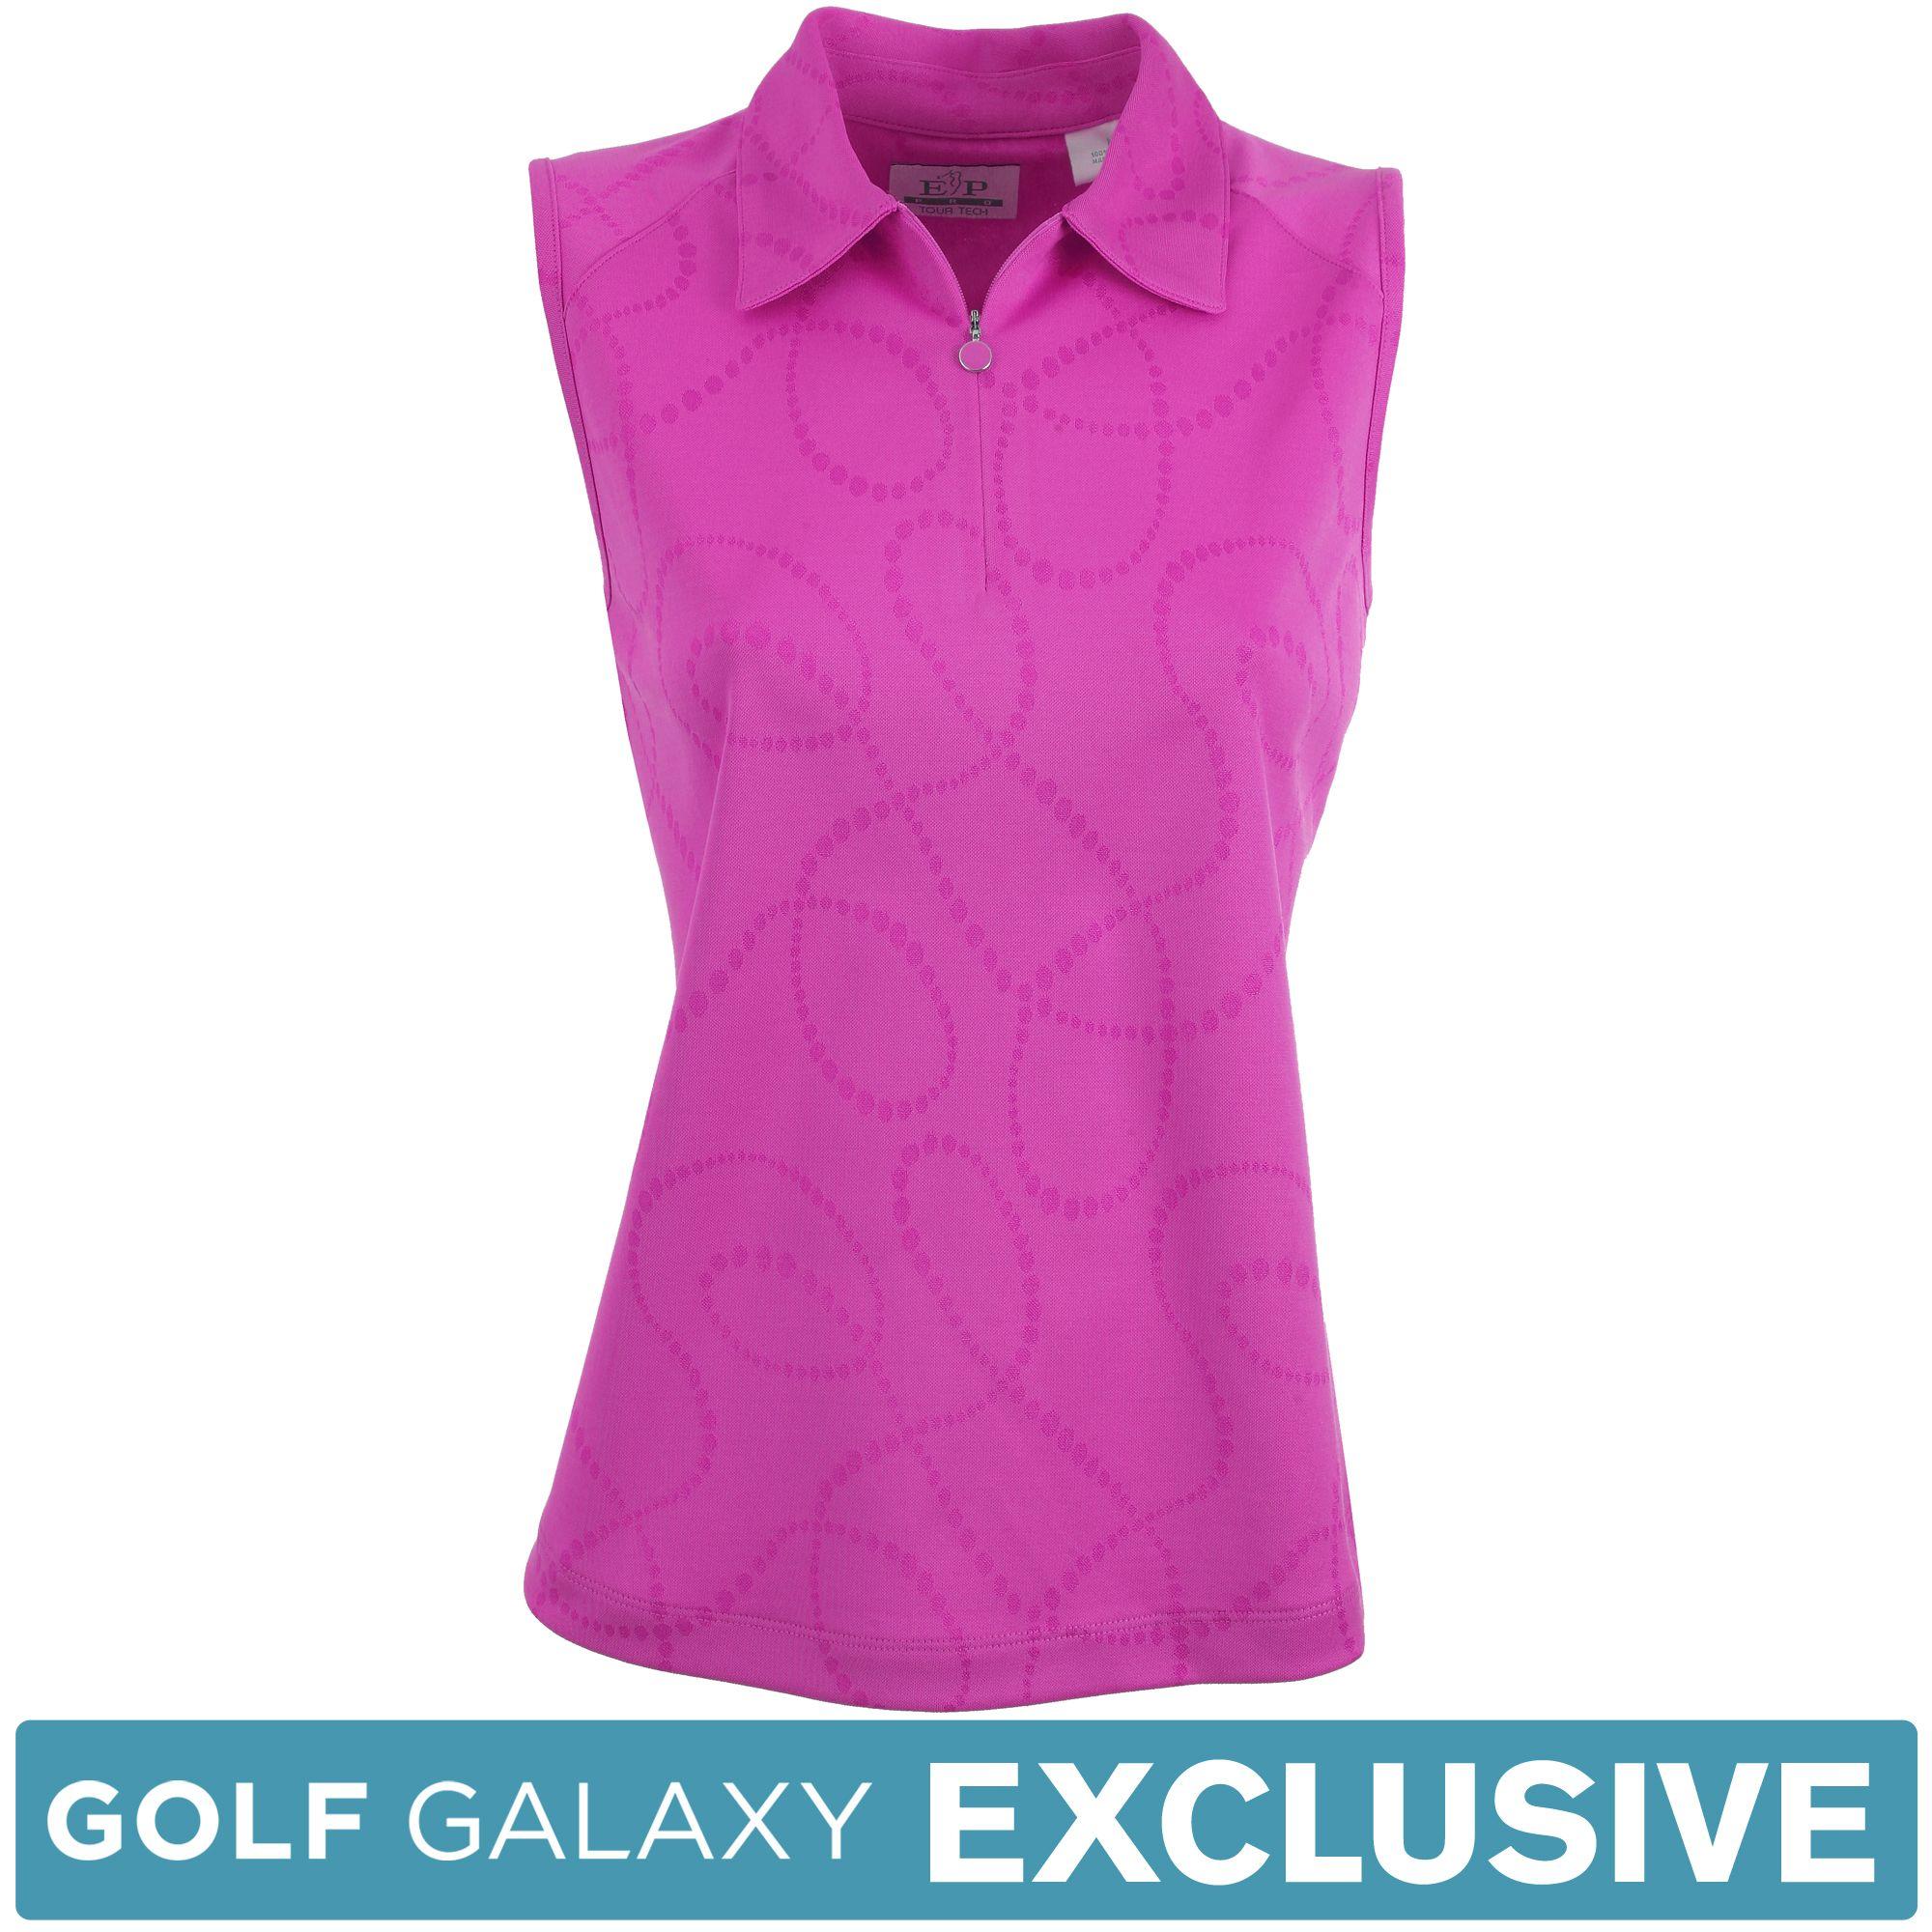 EP Pro Women's Tour-Tech Pearl Print Sleeveless Polo